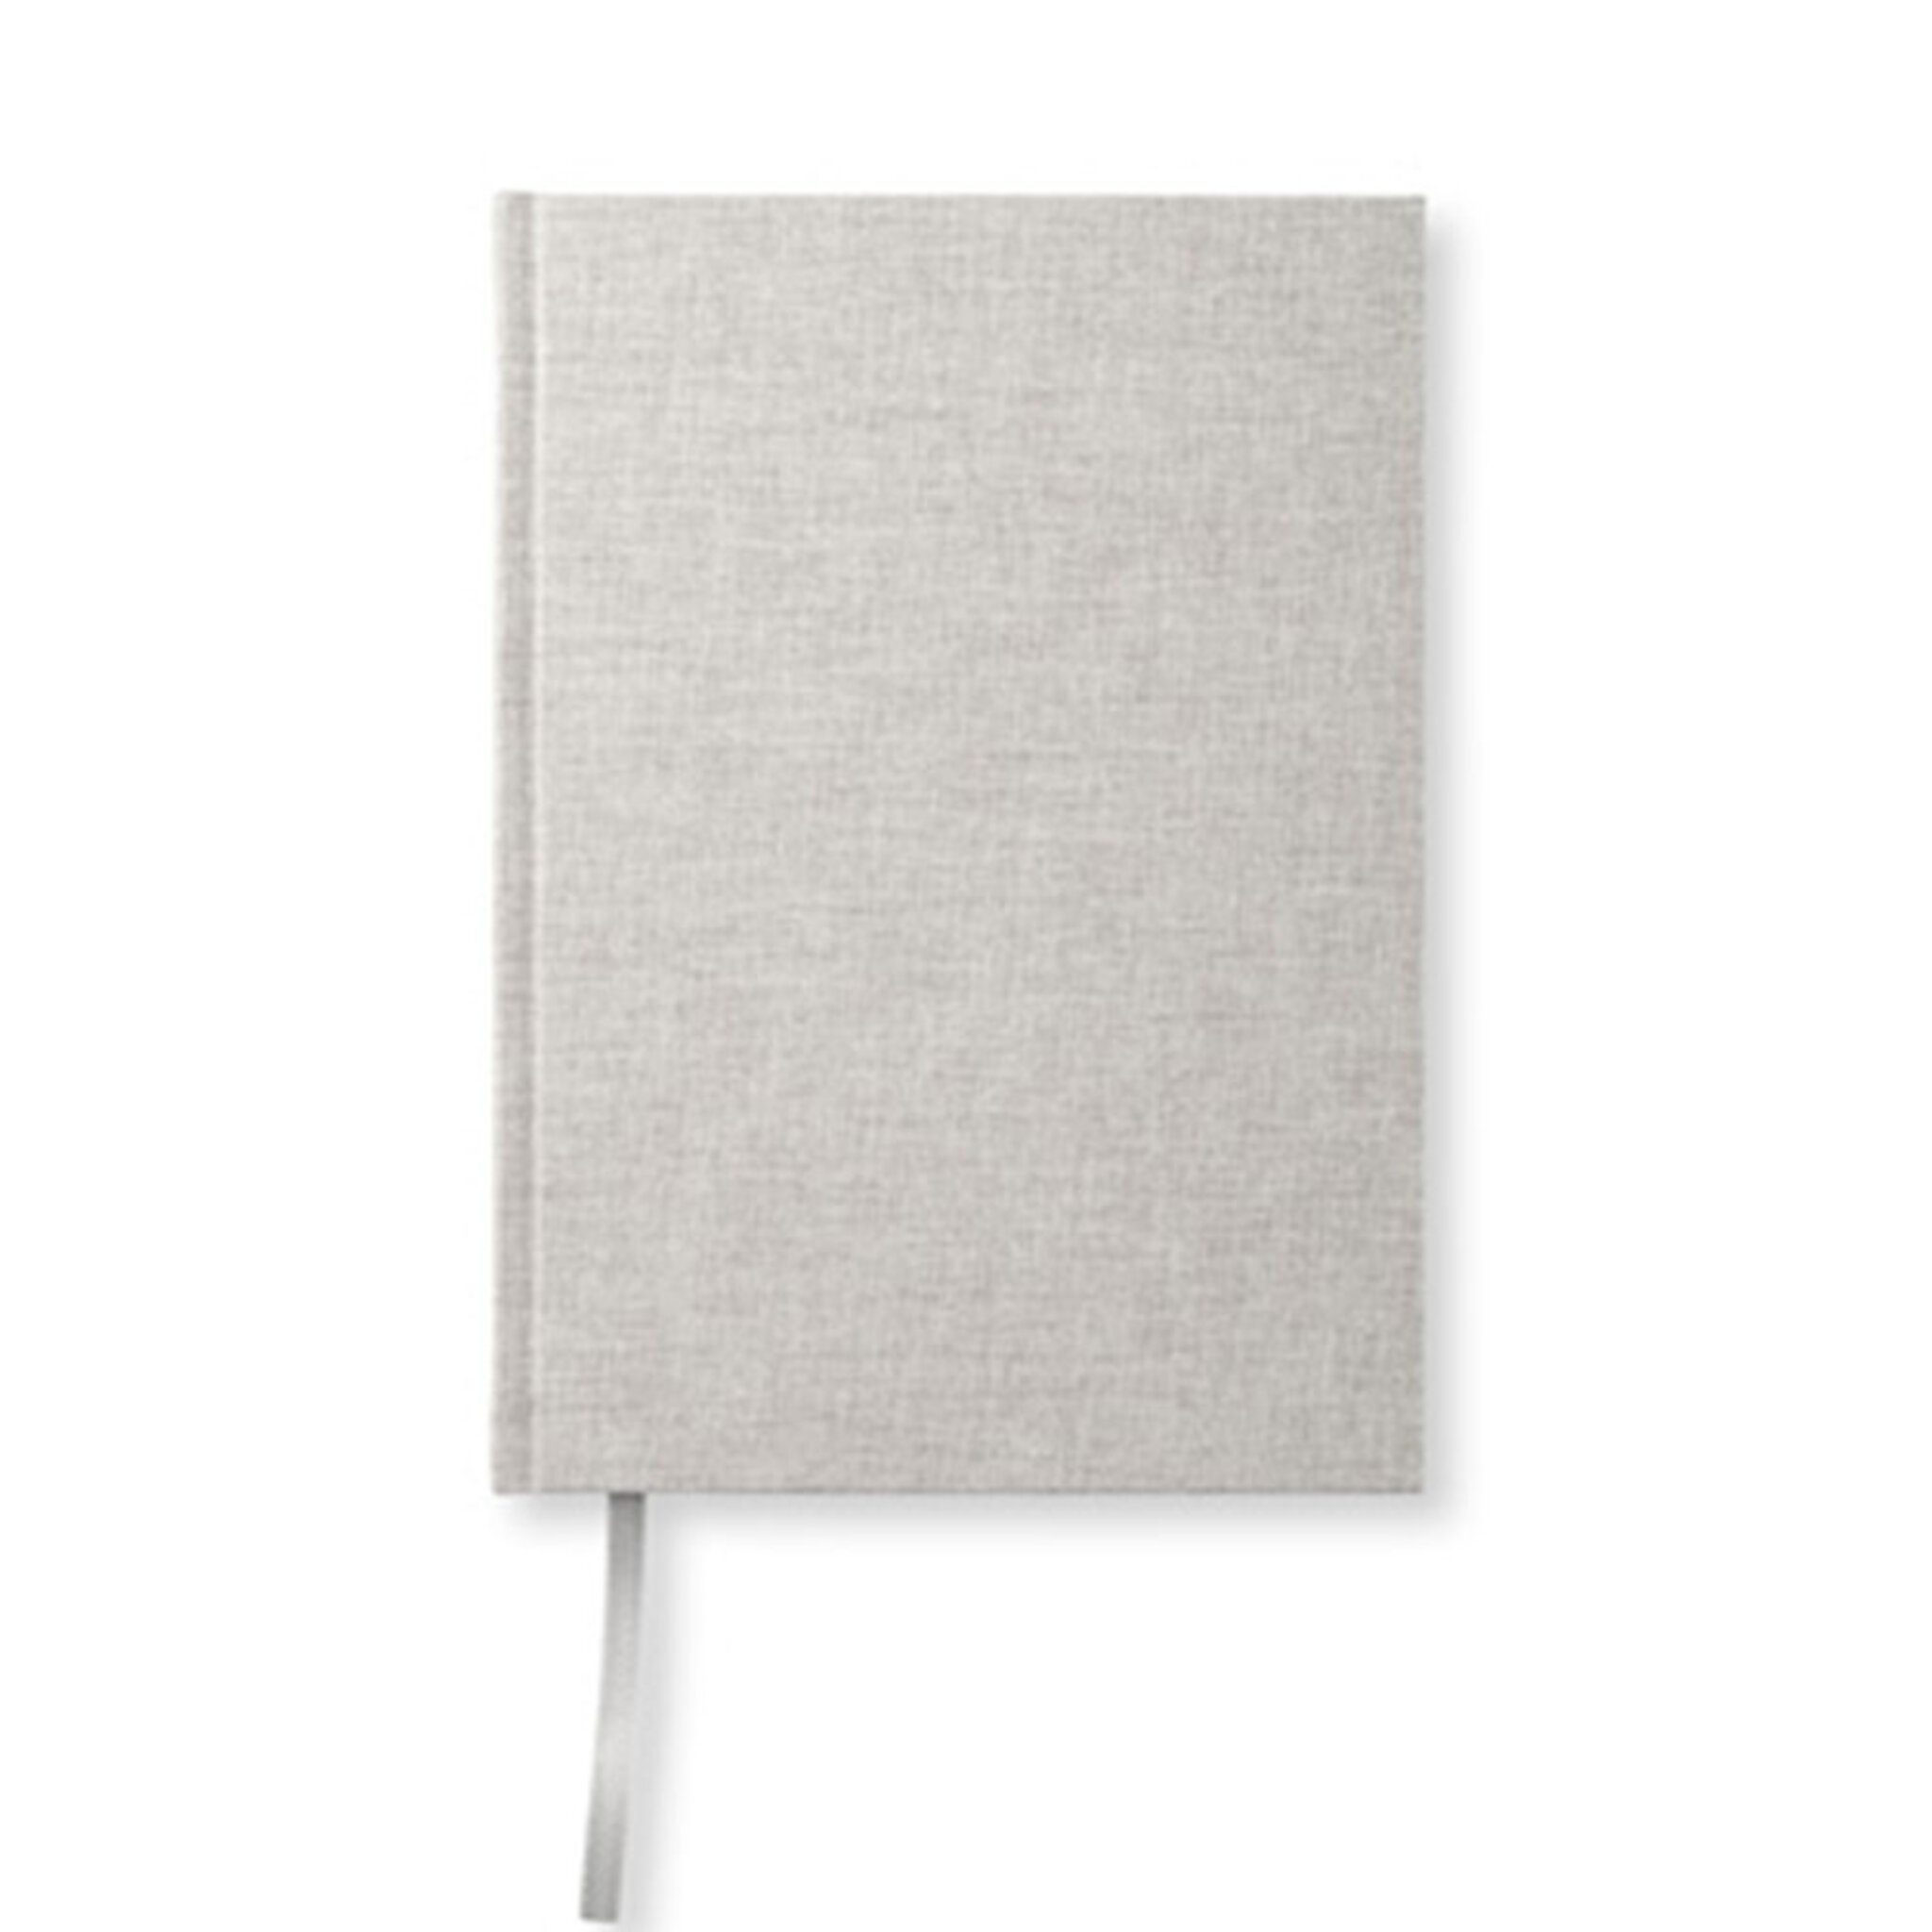 Anteckningsbok A5, 128 linjerade sidor, natur, 21,5X15,5